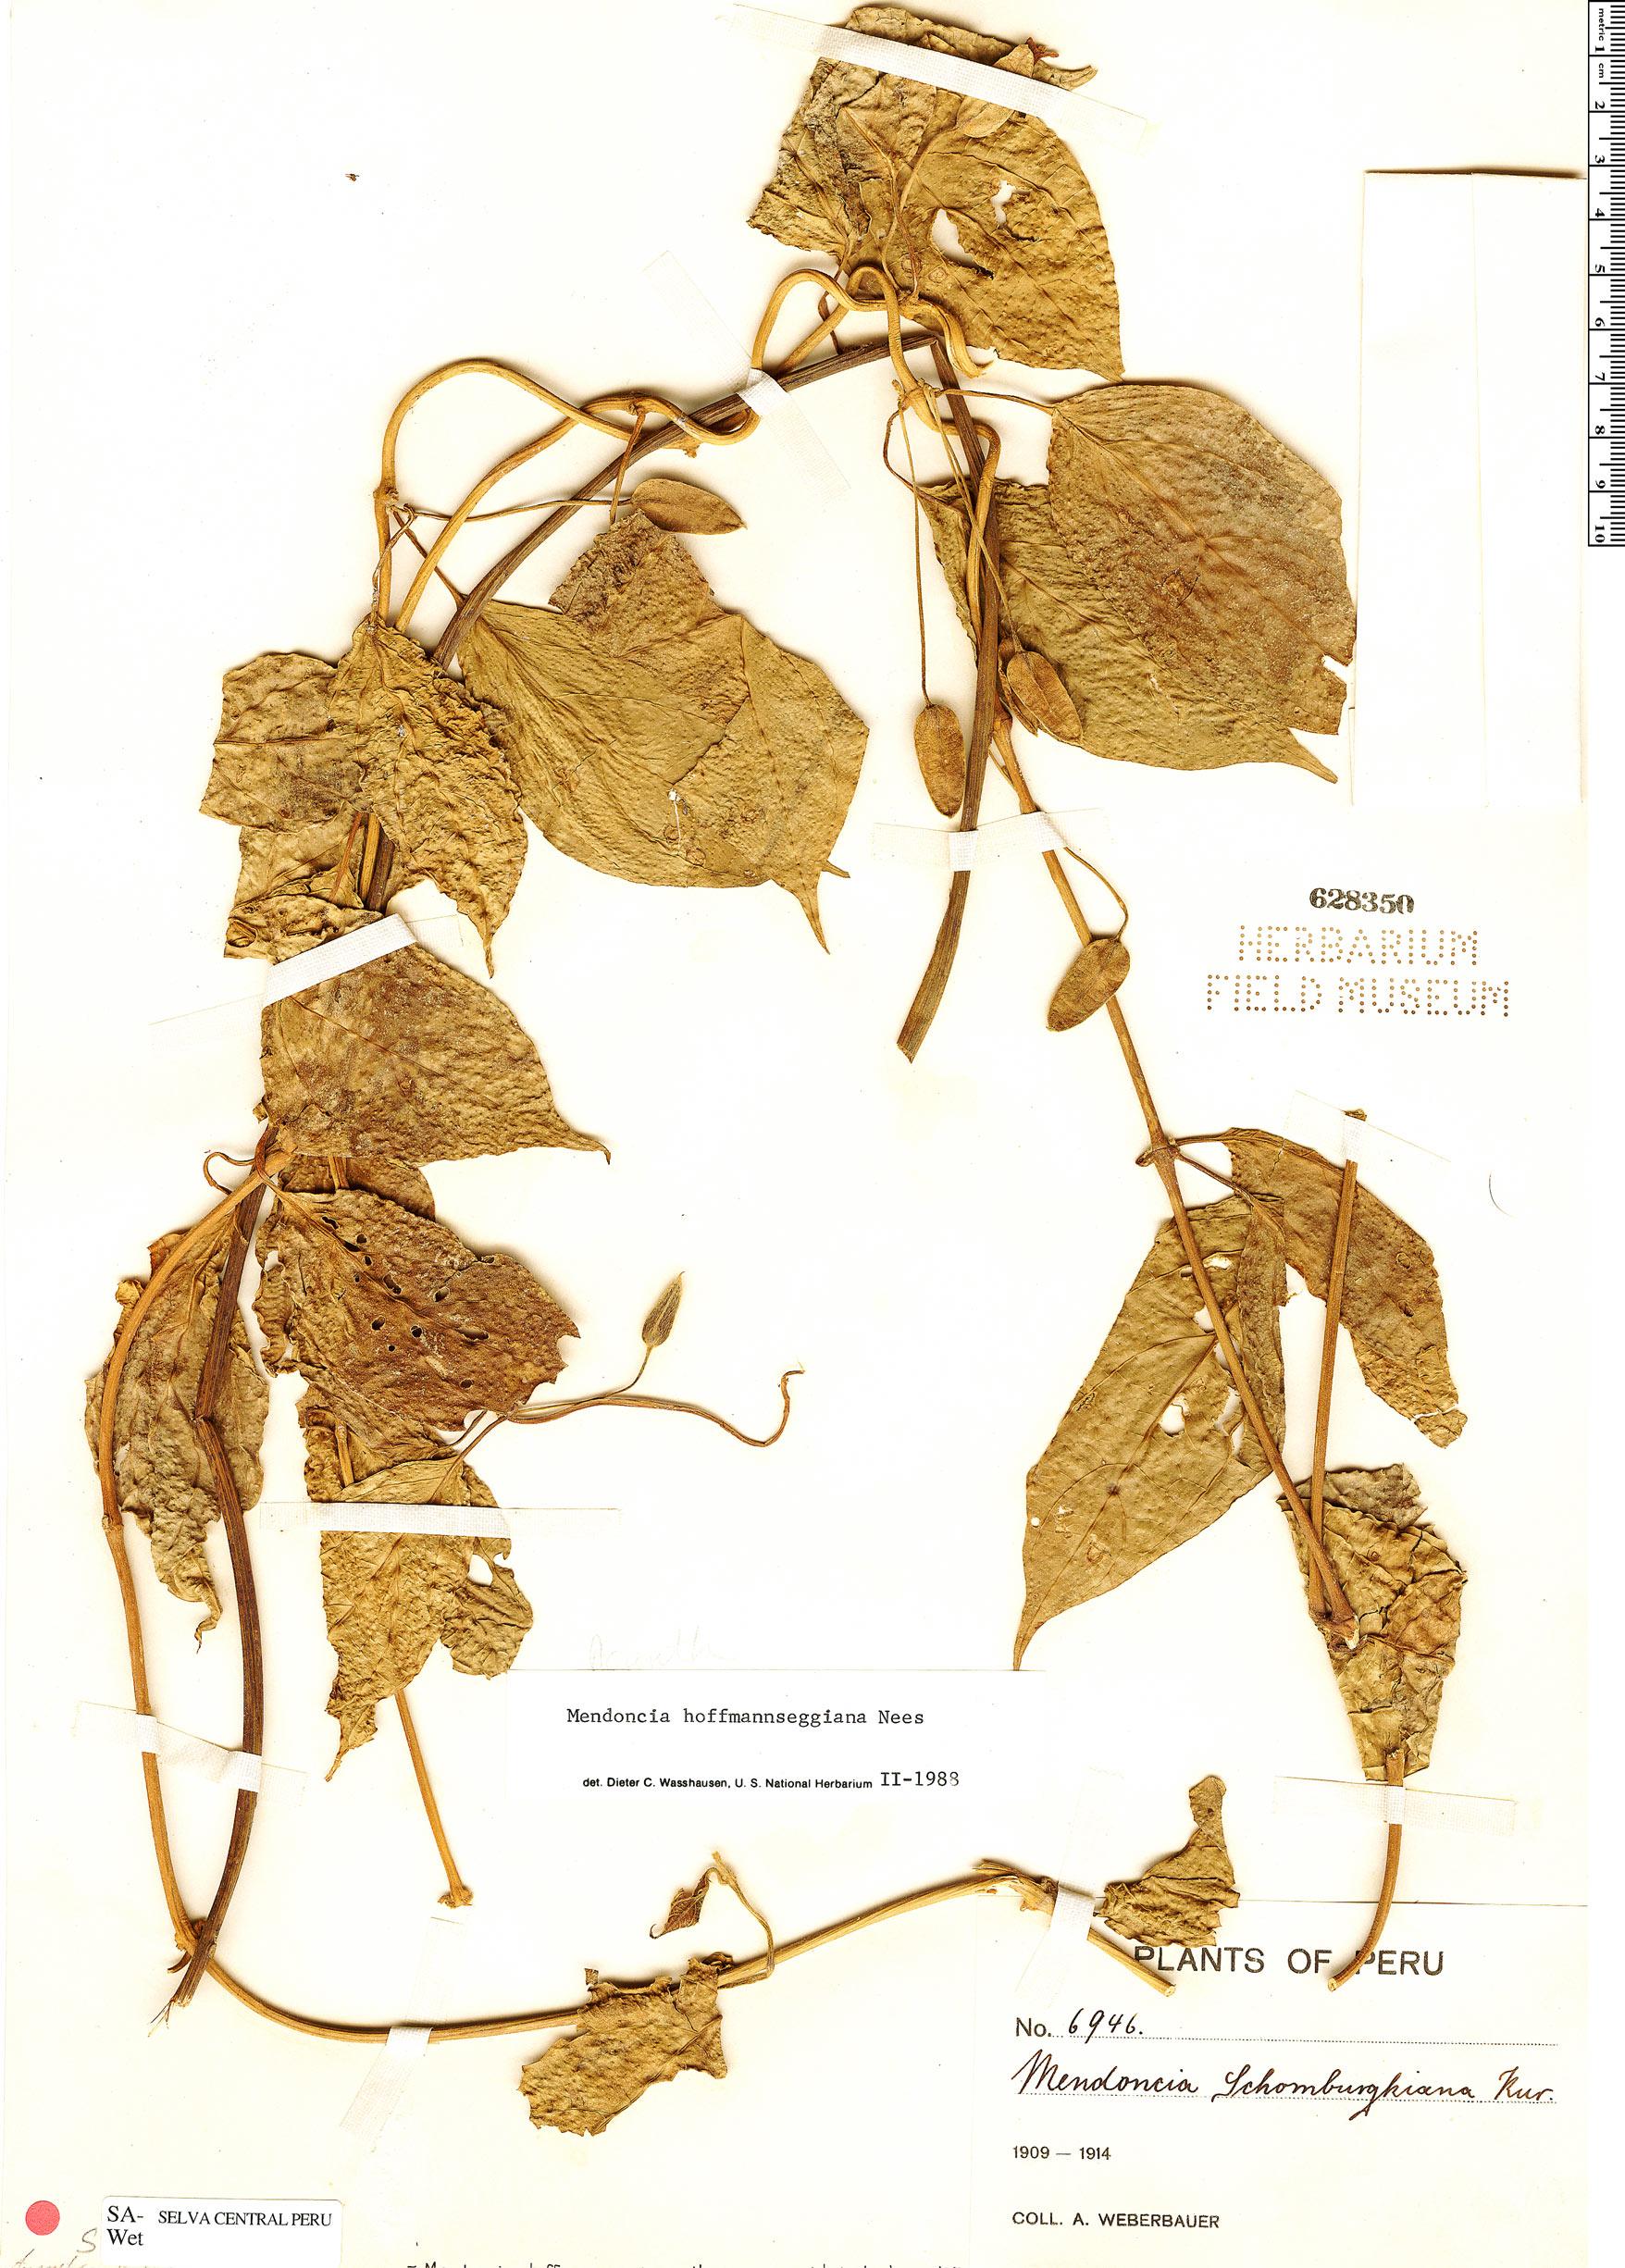 Specimen: Mendoncia hoffmannseggiana